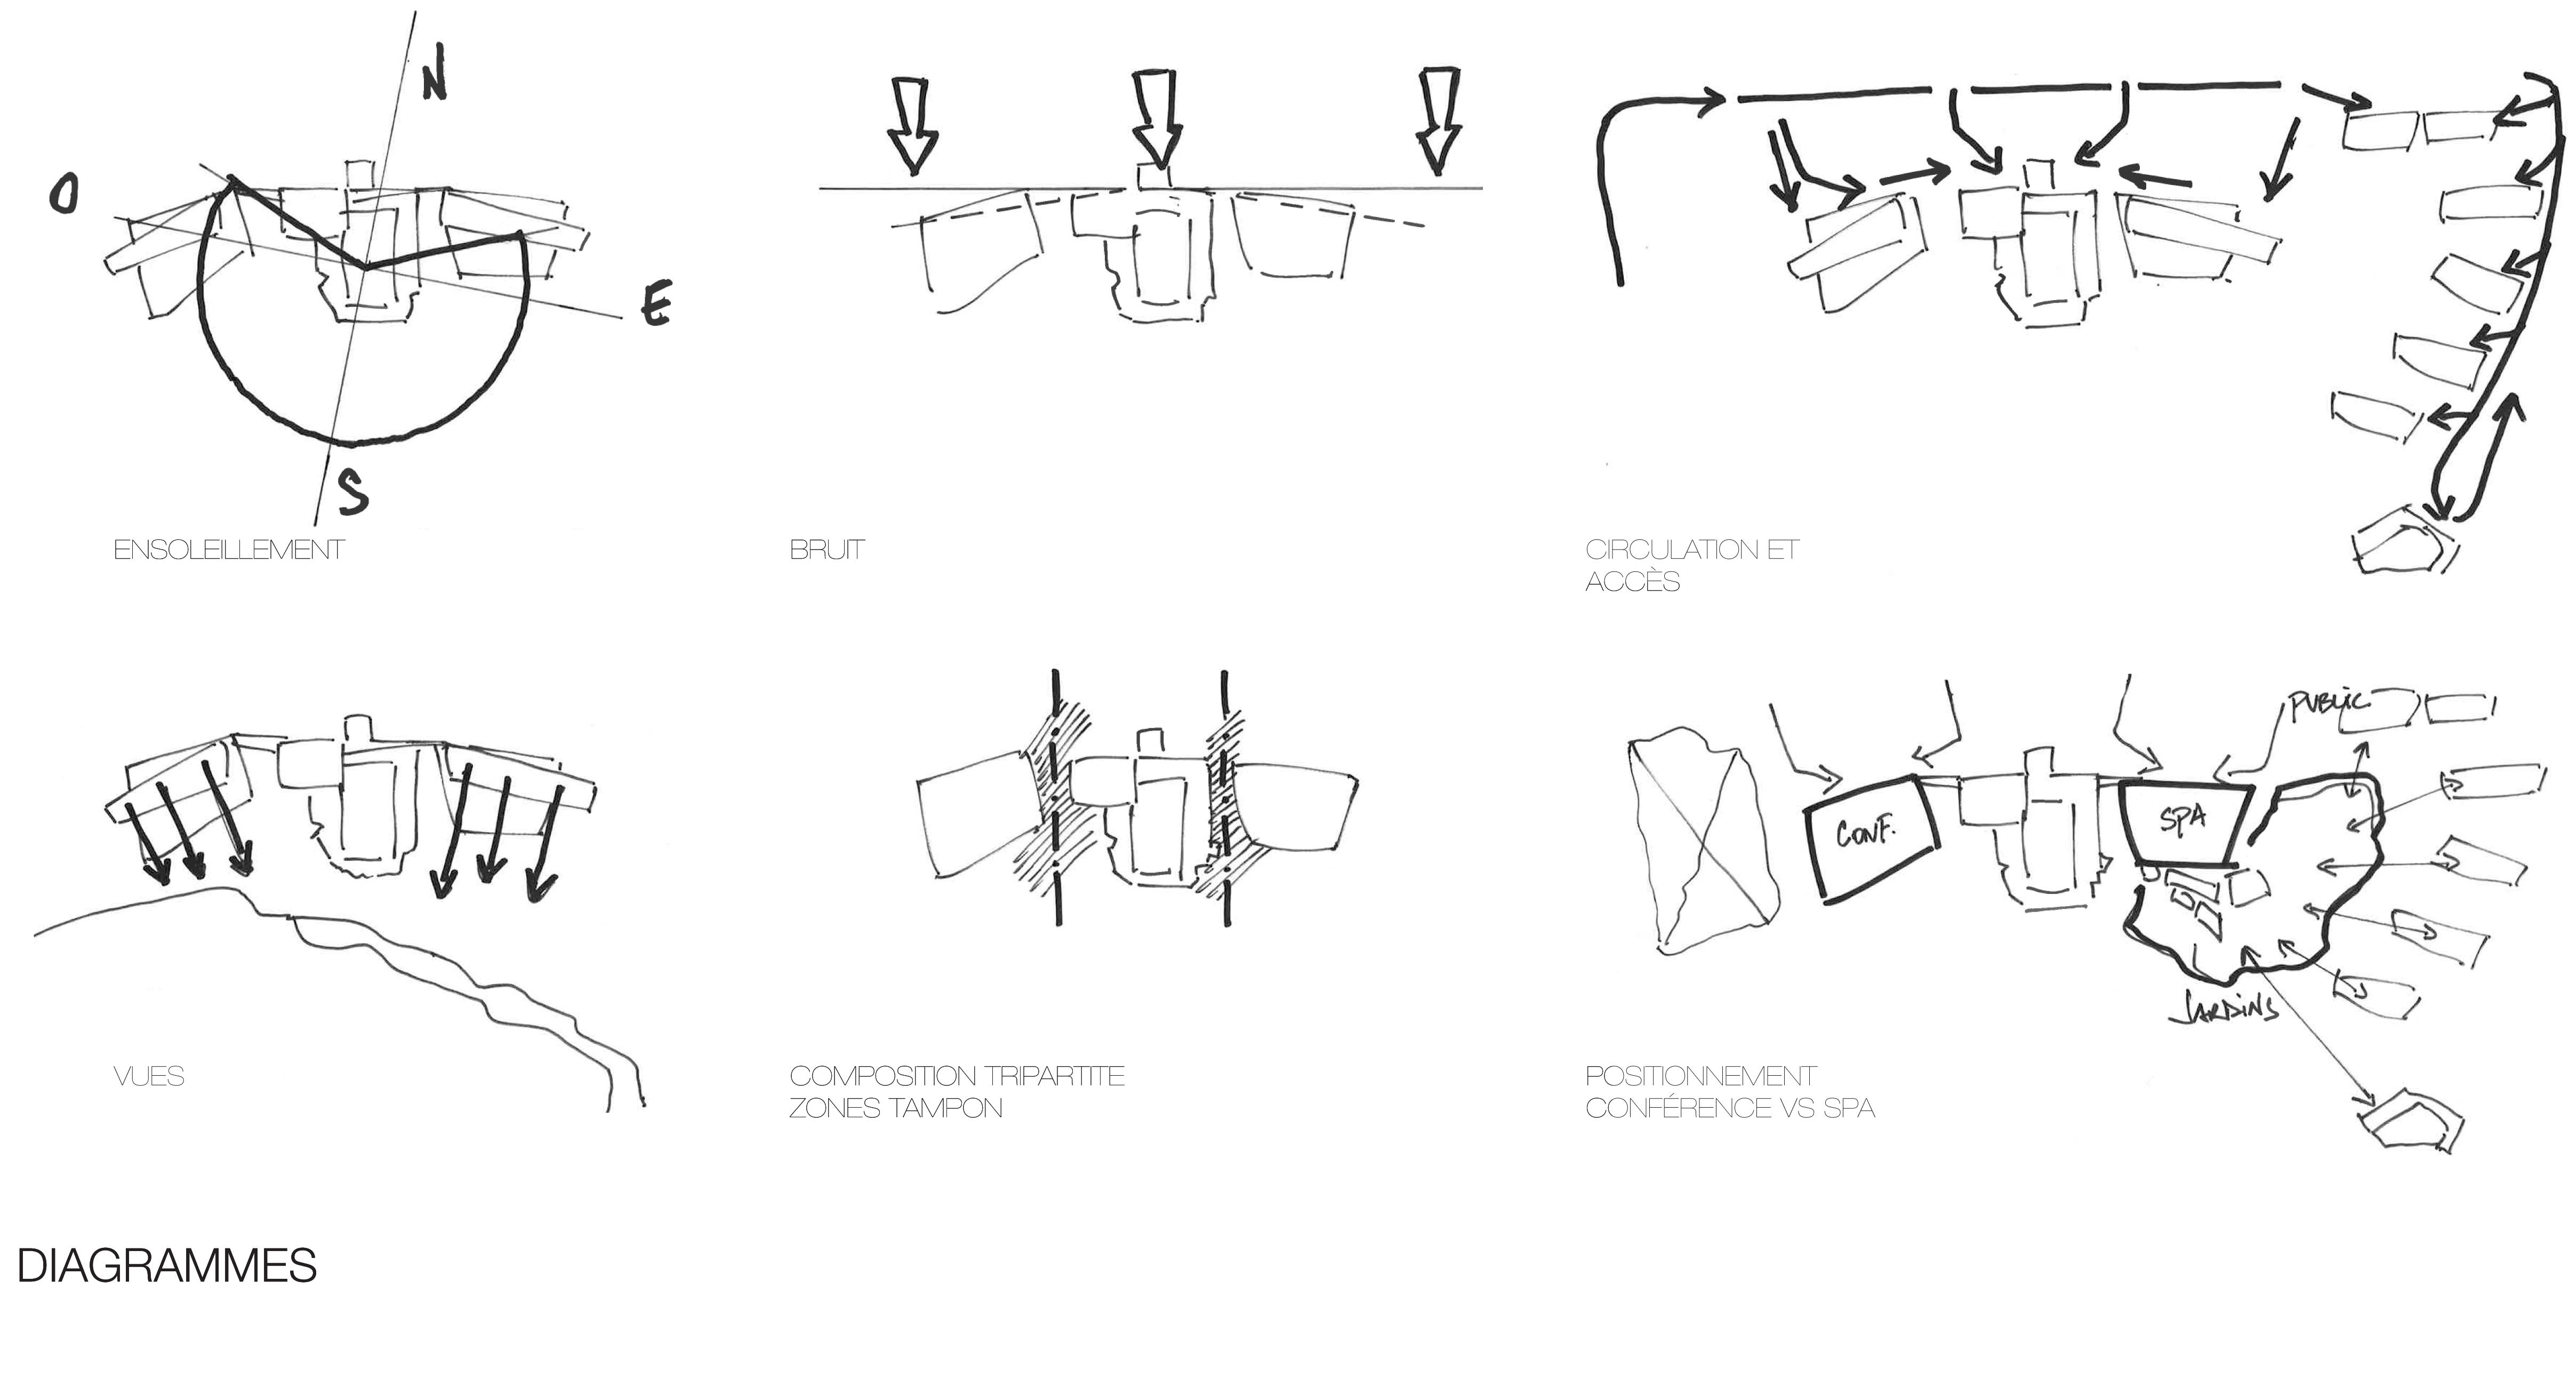 002-diagrammes